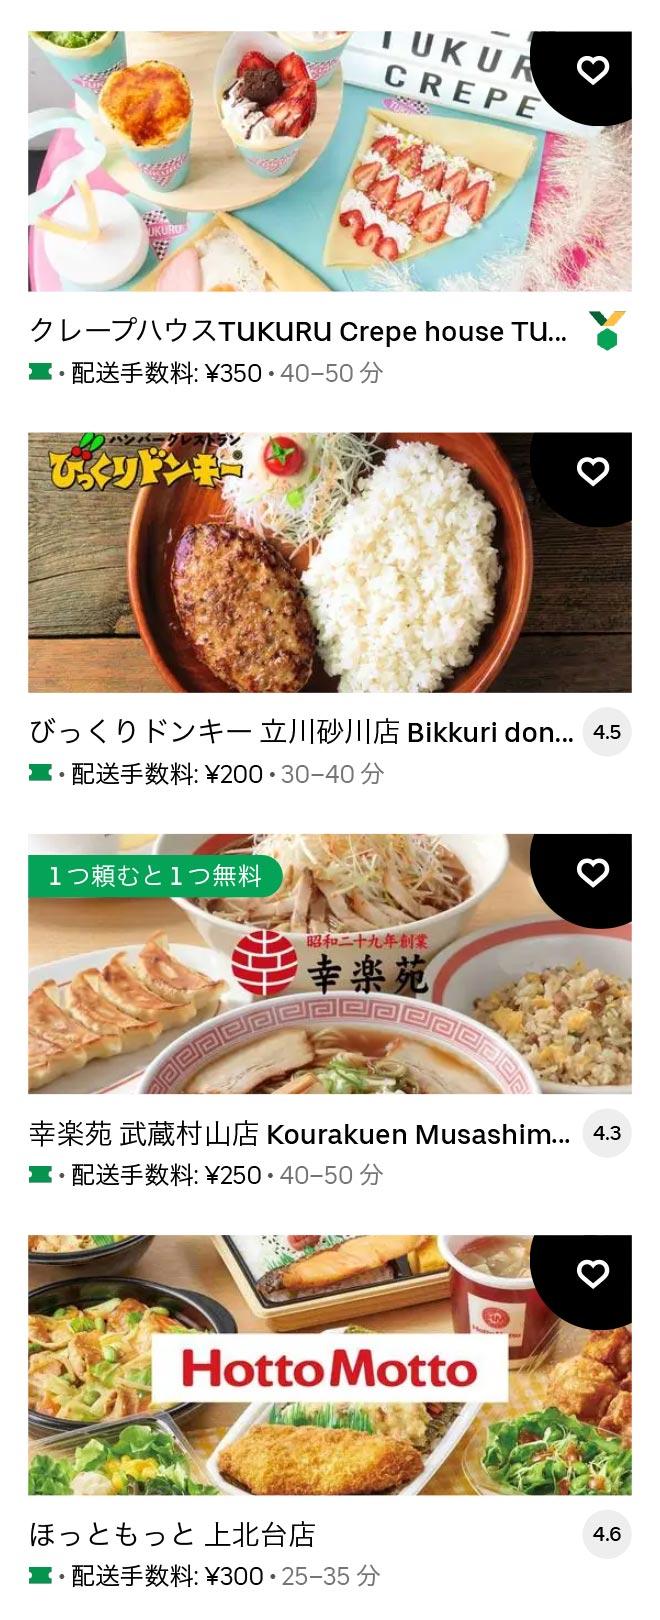 U musashi murayama 2106 01